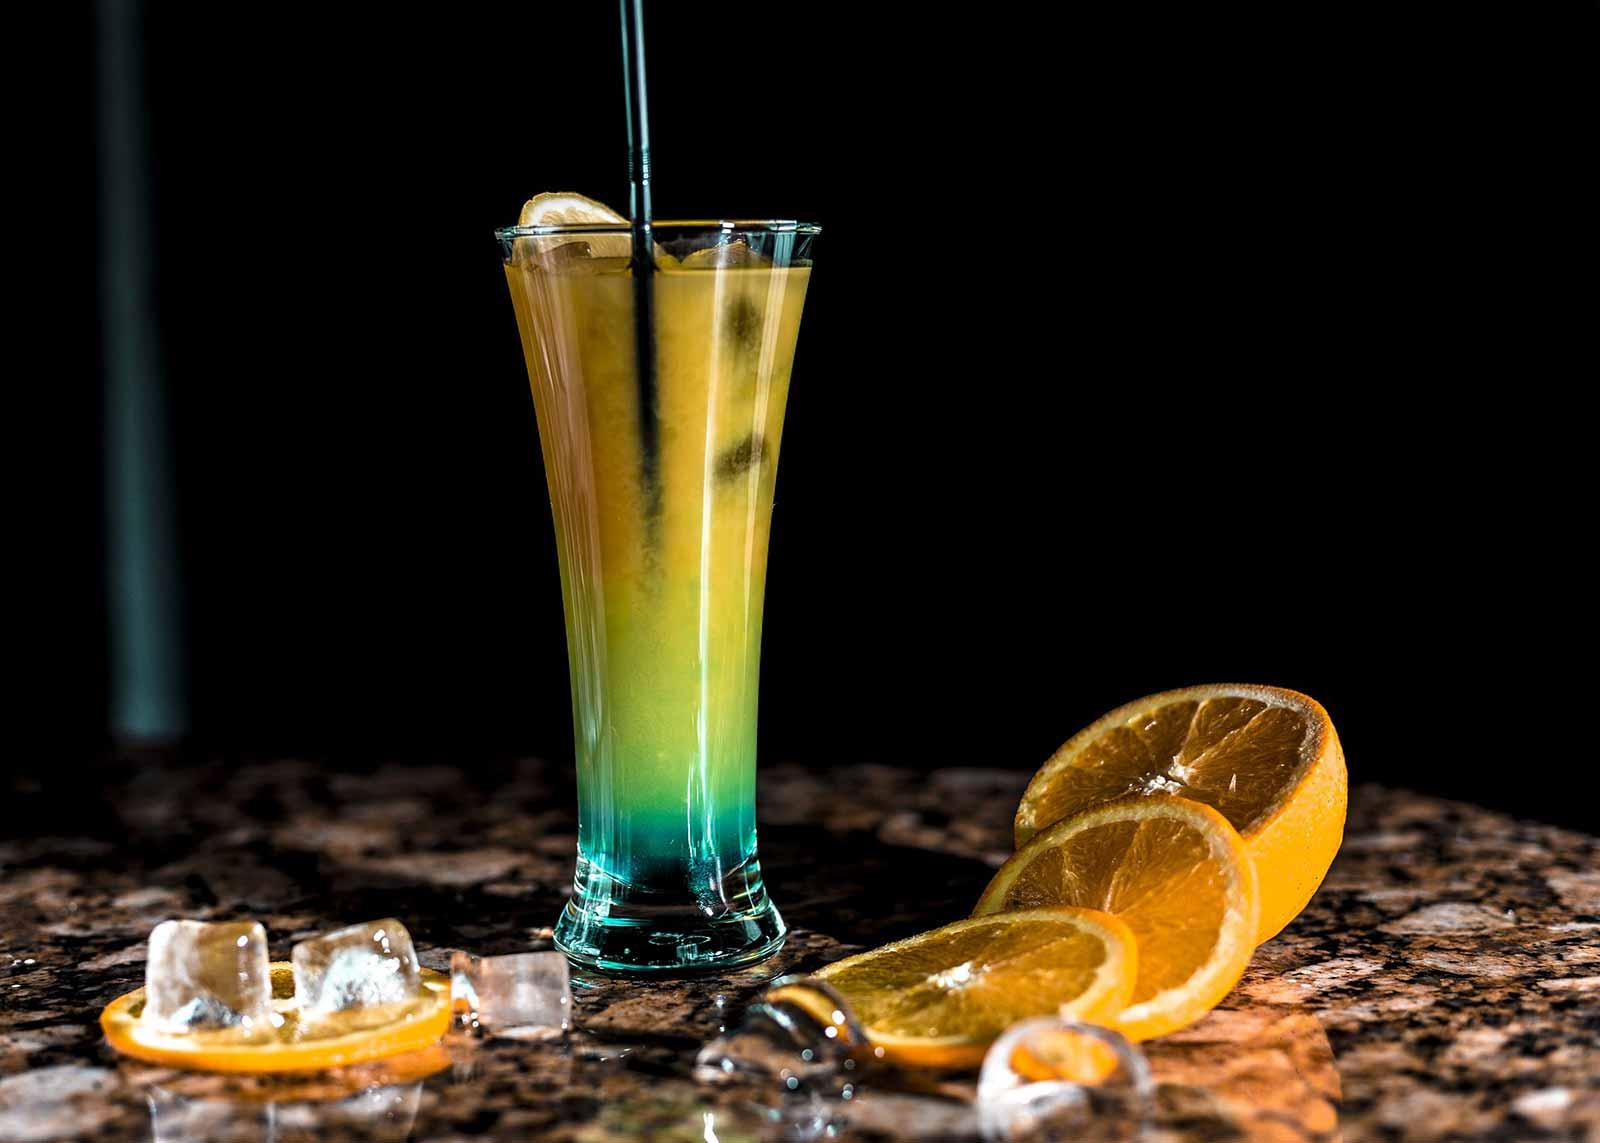 Cocktail-Workshop-Mallorca-Cocktails-mixen-Mallorca-5